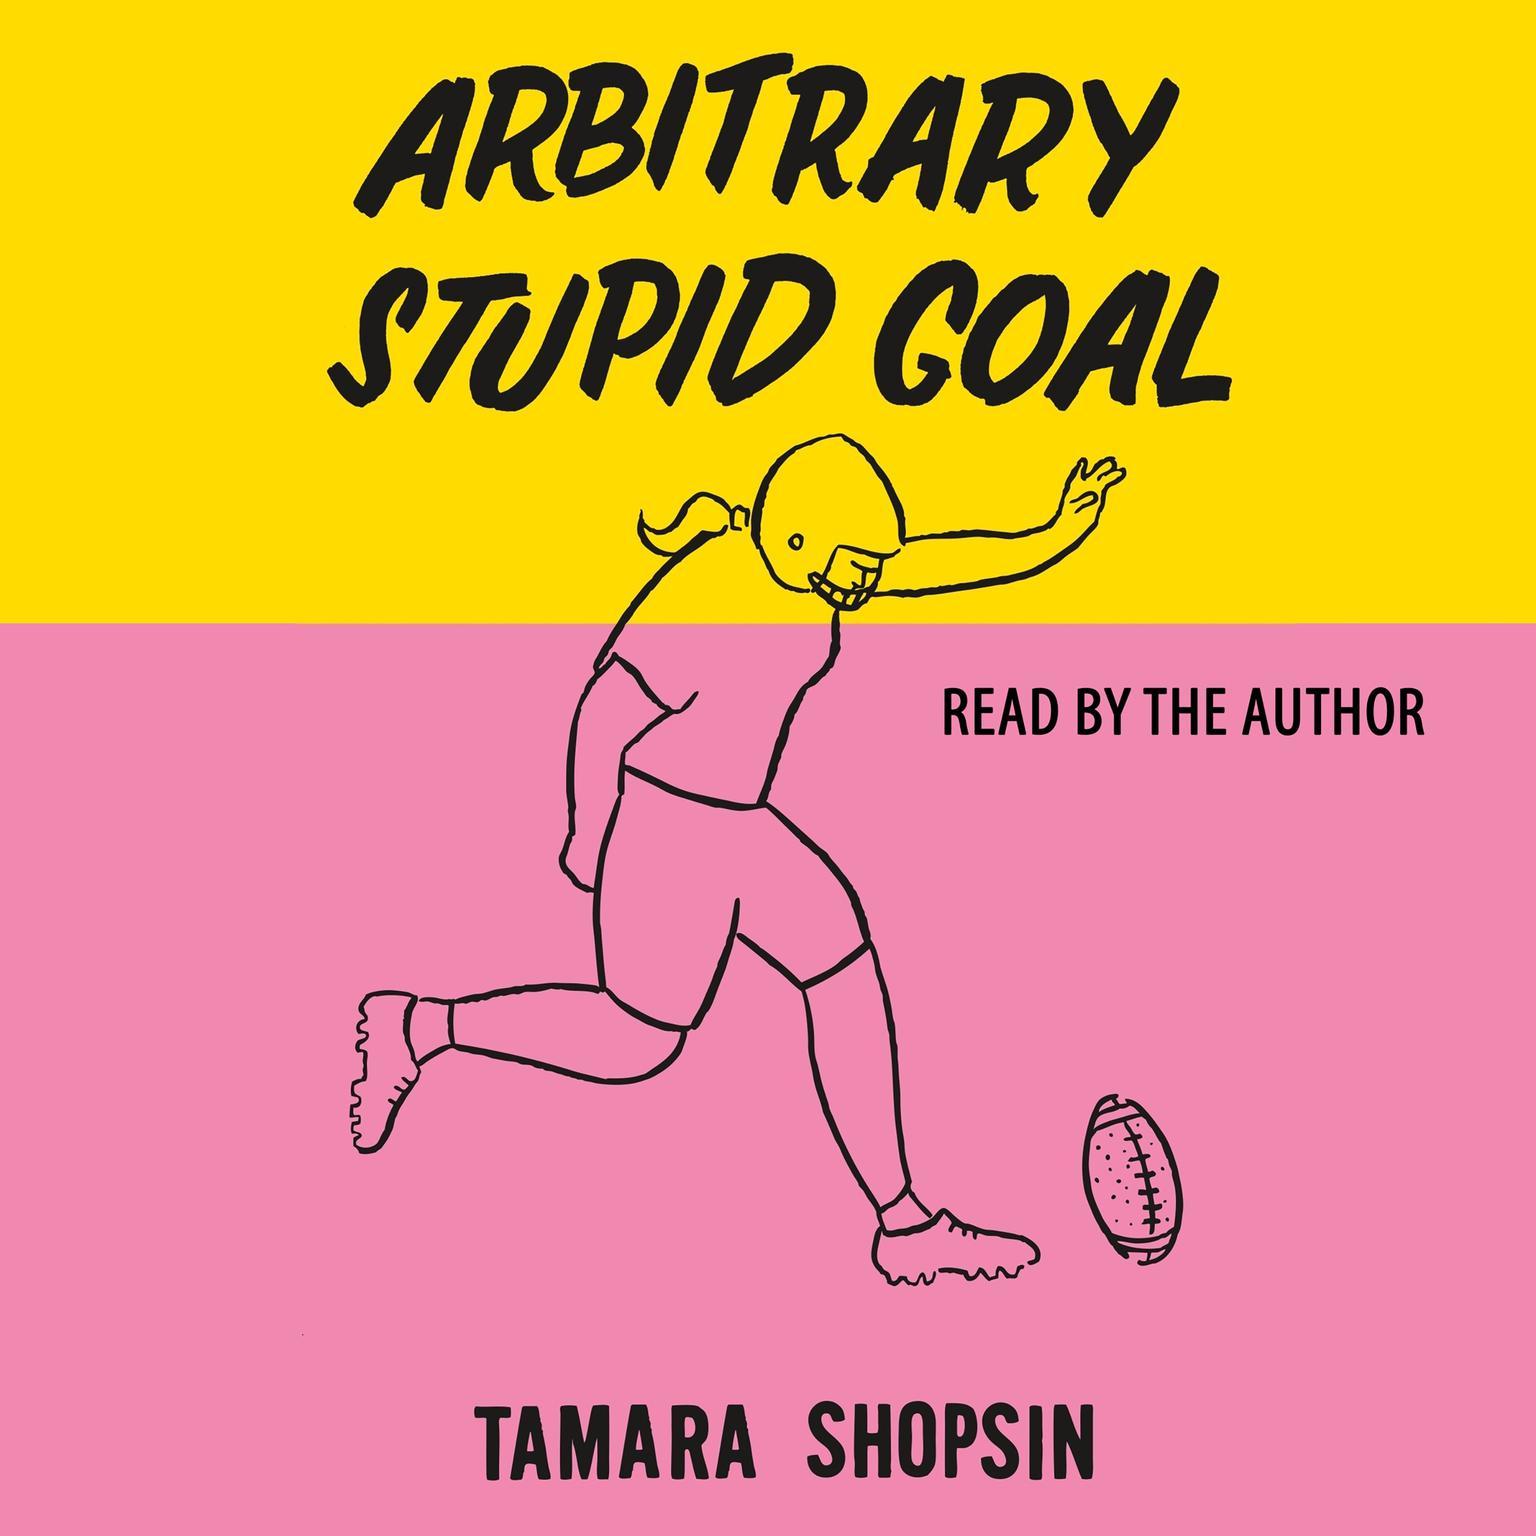 Arbitrary Stupid Goal - Audiobook | Listen Instantly!